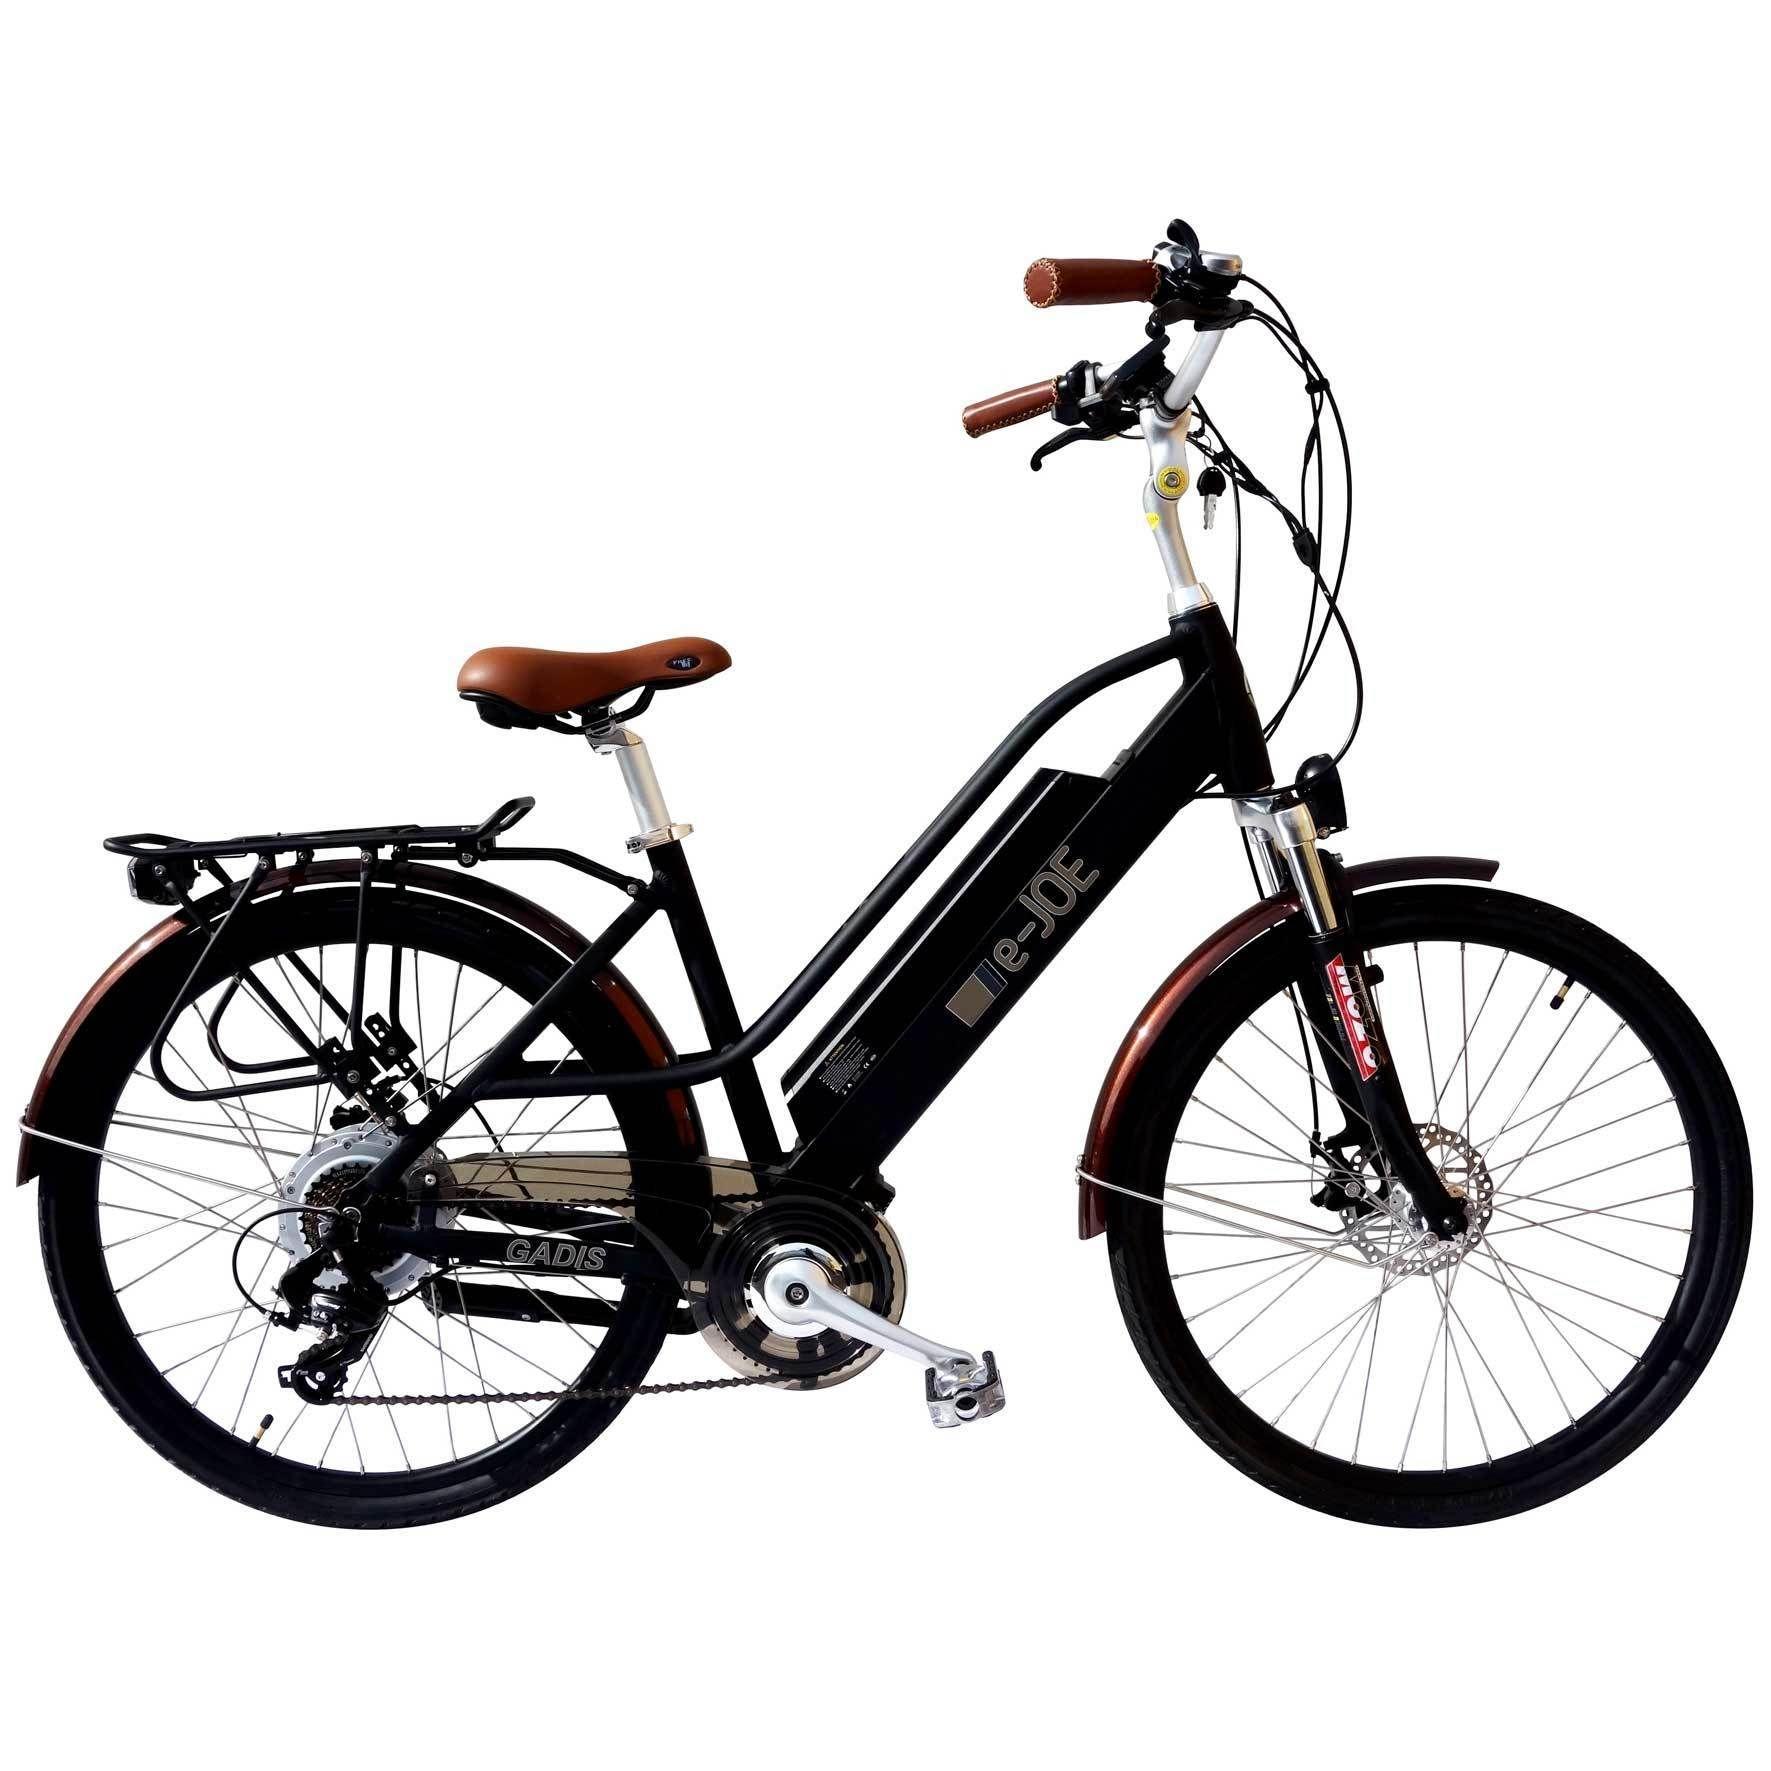 EJoe Gadis 48V 500W StepThrough Electric Bike Beach